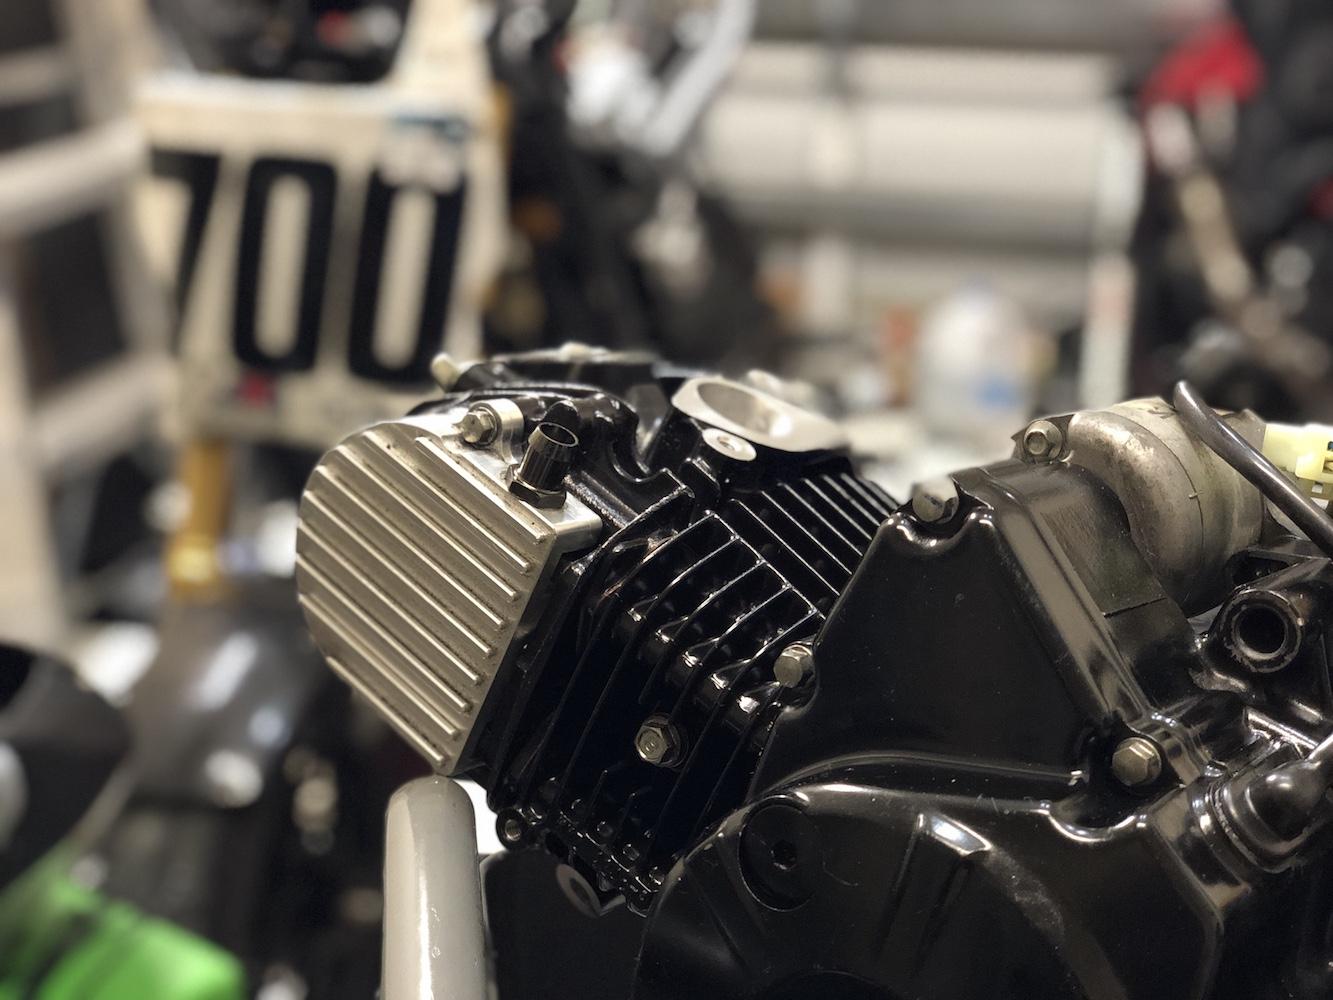 Honda Grom 2-Valve Head Porting Service